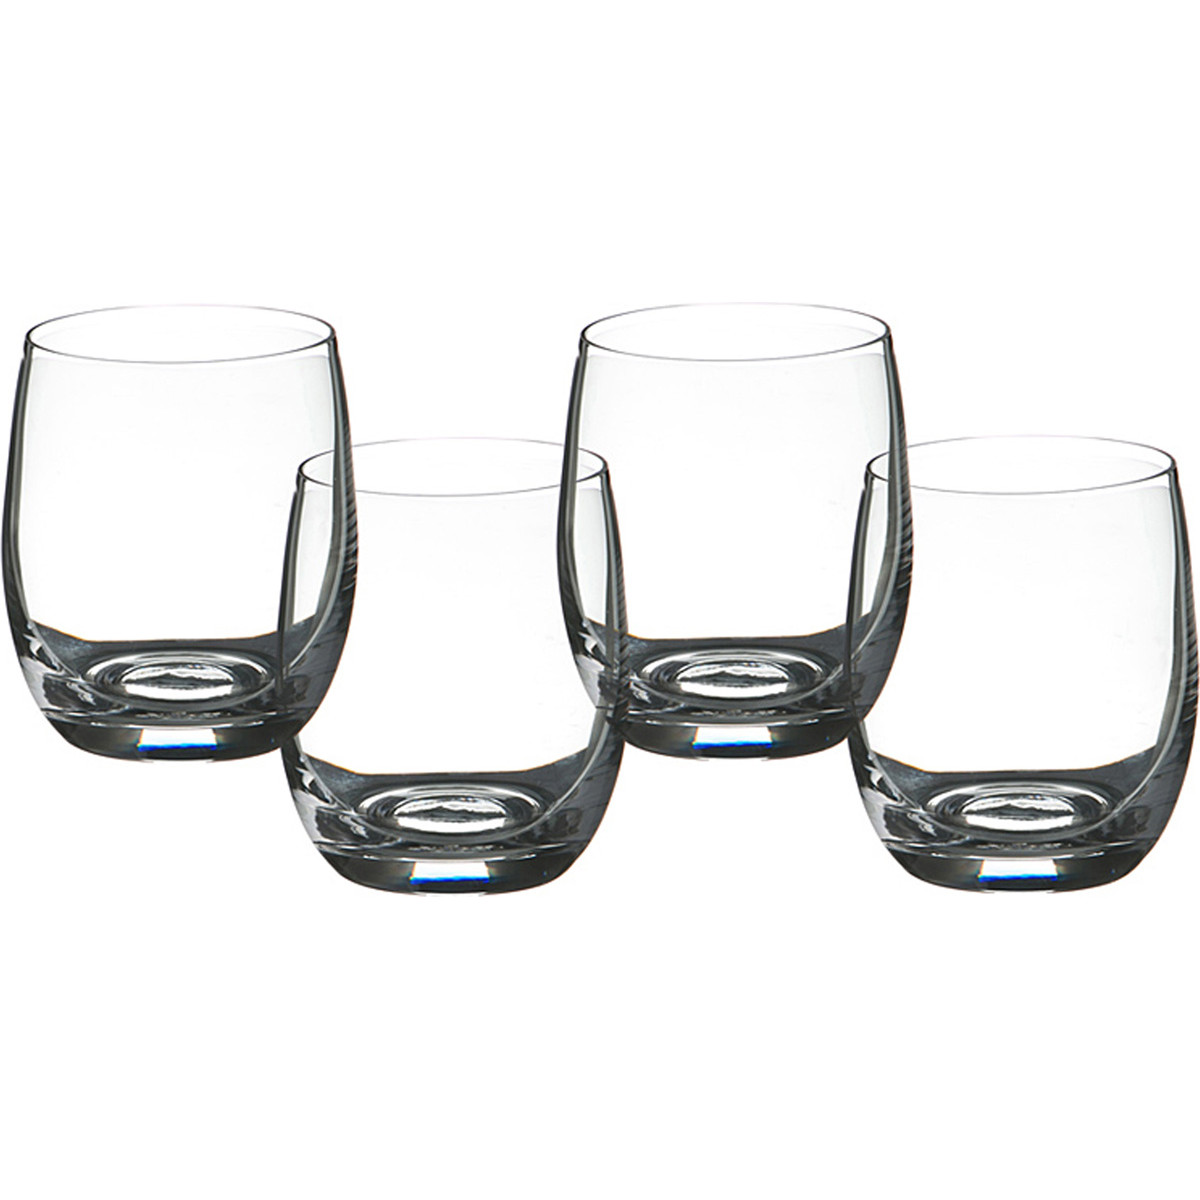 {} Bohemia Crystal Набор стаканов для виски Carlyle  (10 см - 4 шт) crystal bohemia